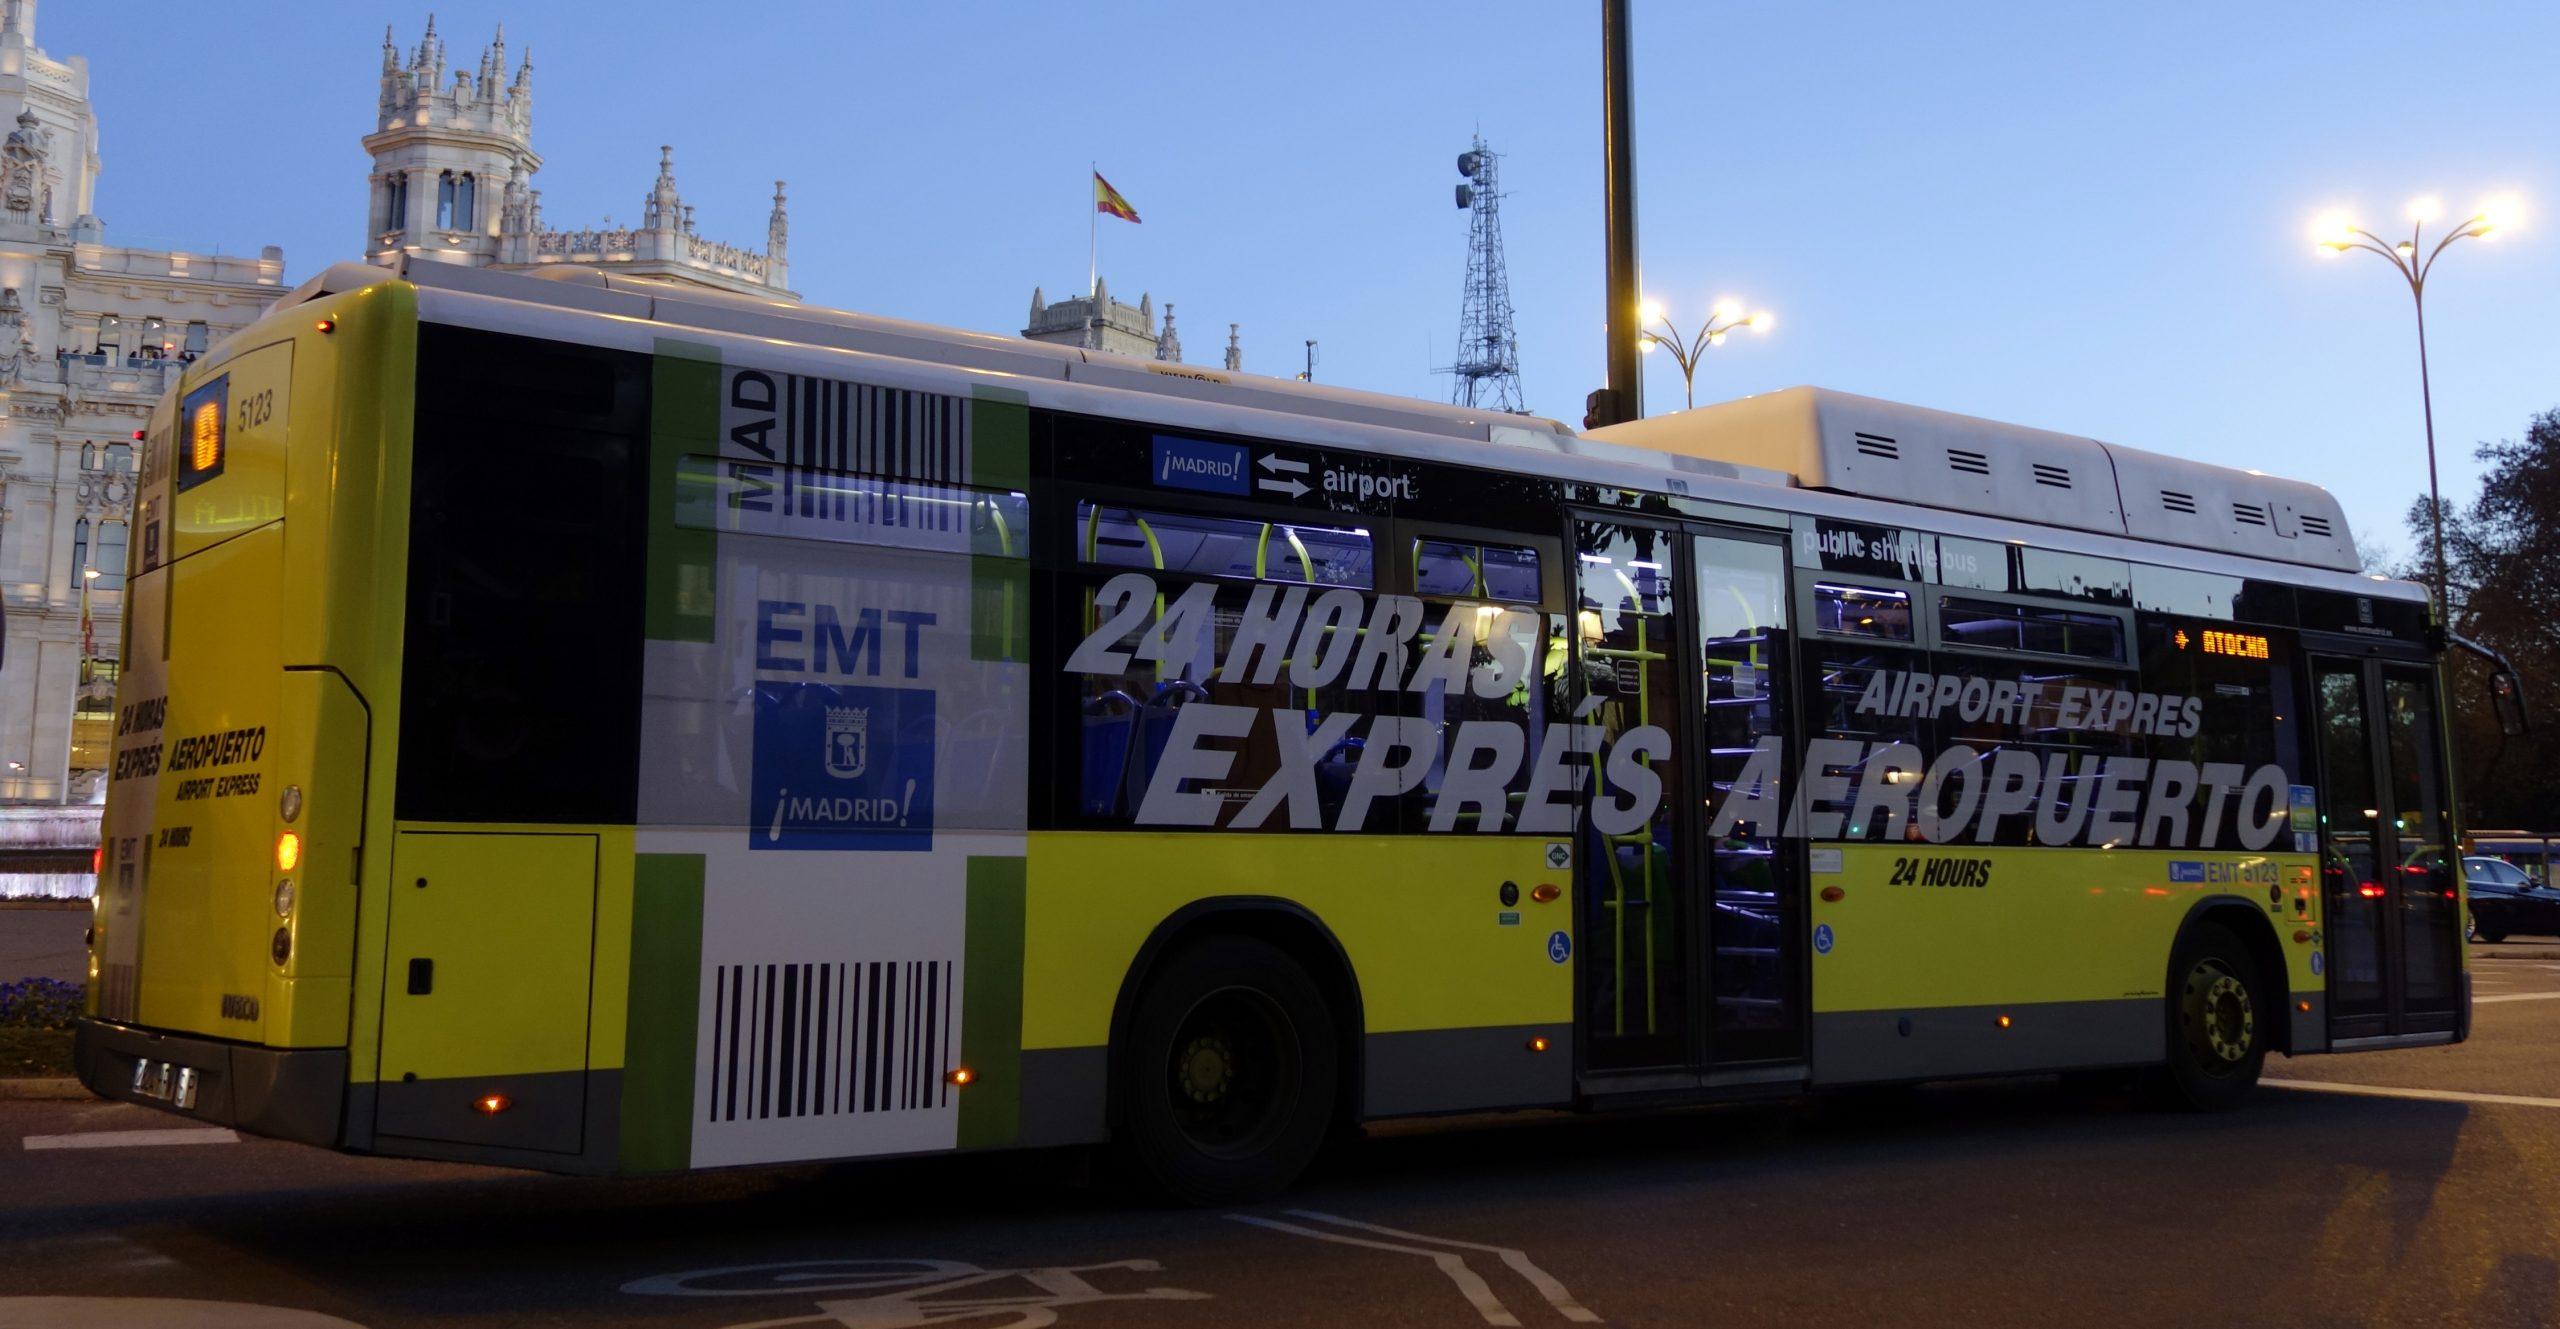 Madrid Airport Bus (Madrid Airport Express Bus), madrid airport to atocha, madrid airport to atocha train station, madrid airport to atocha cheapest way